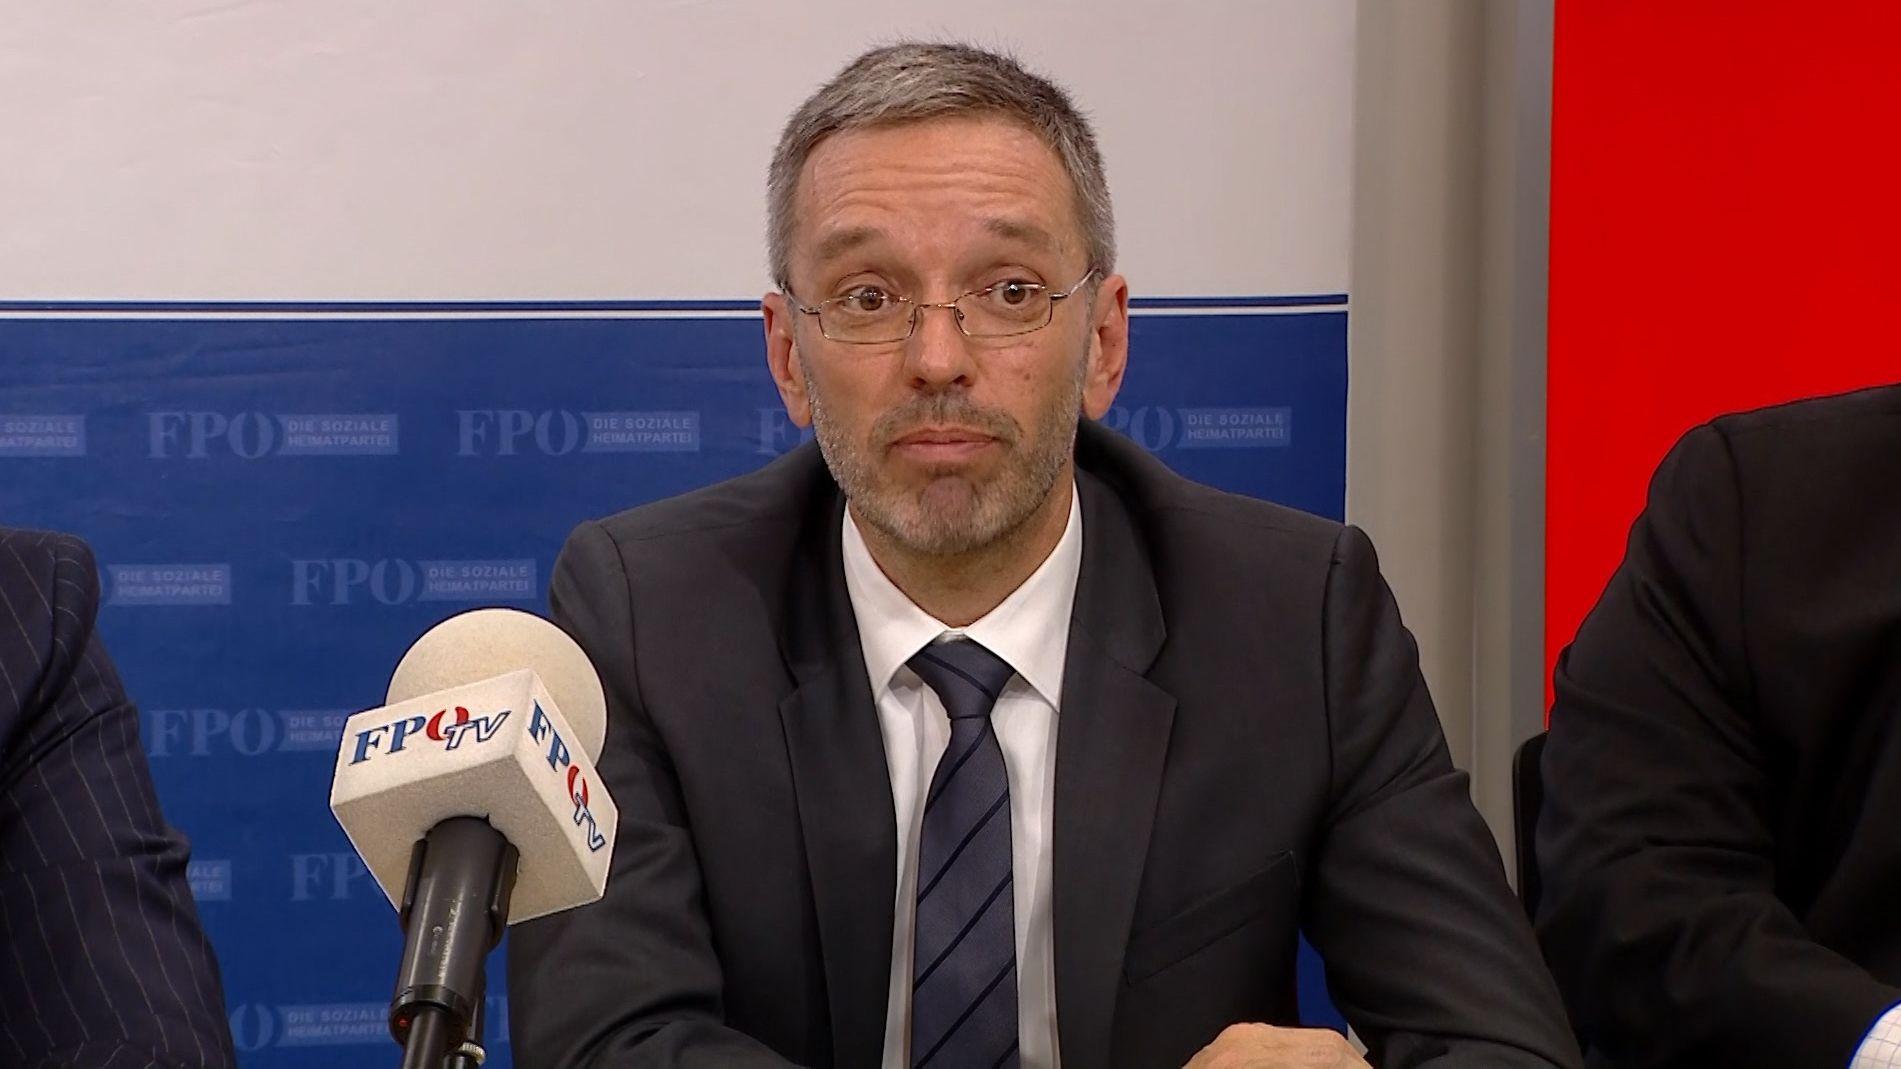 Oesterreichs Innenminister Herbert Kickl (FPOE)